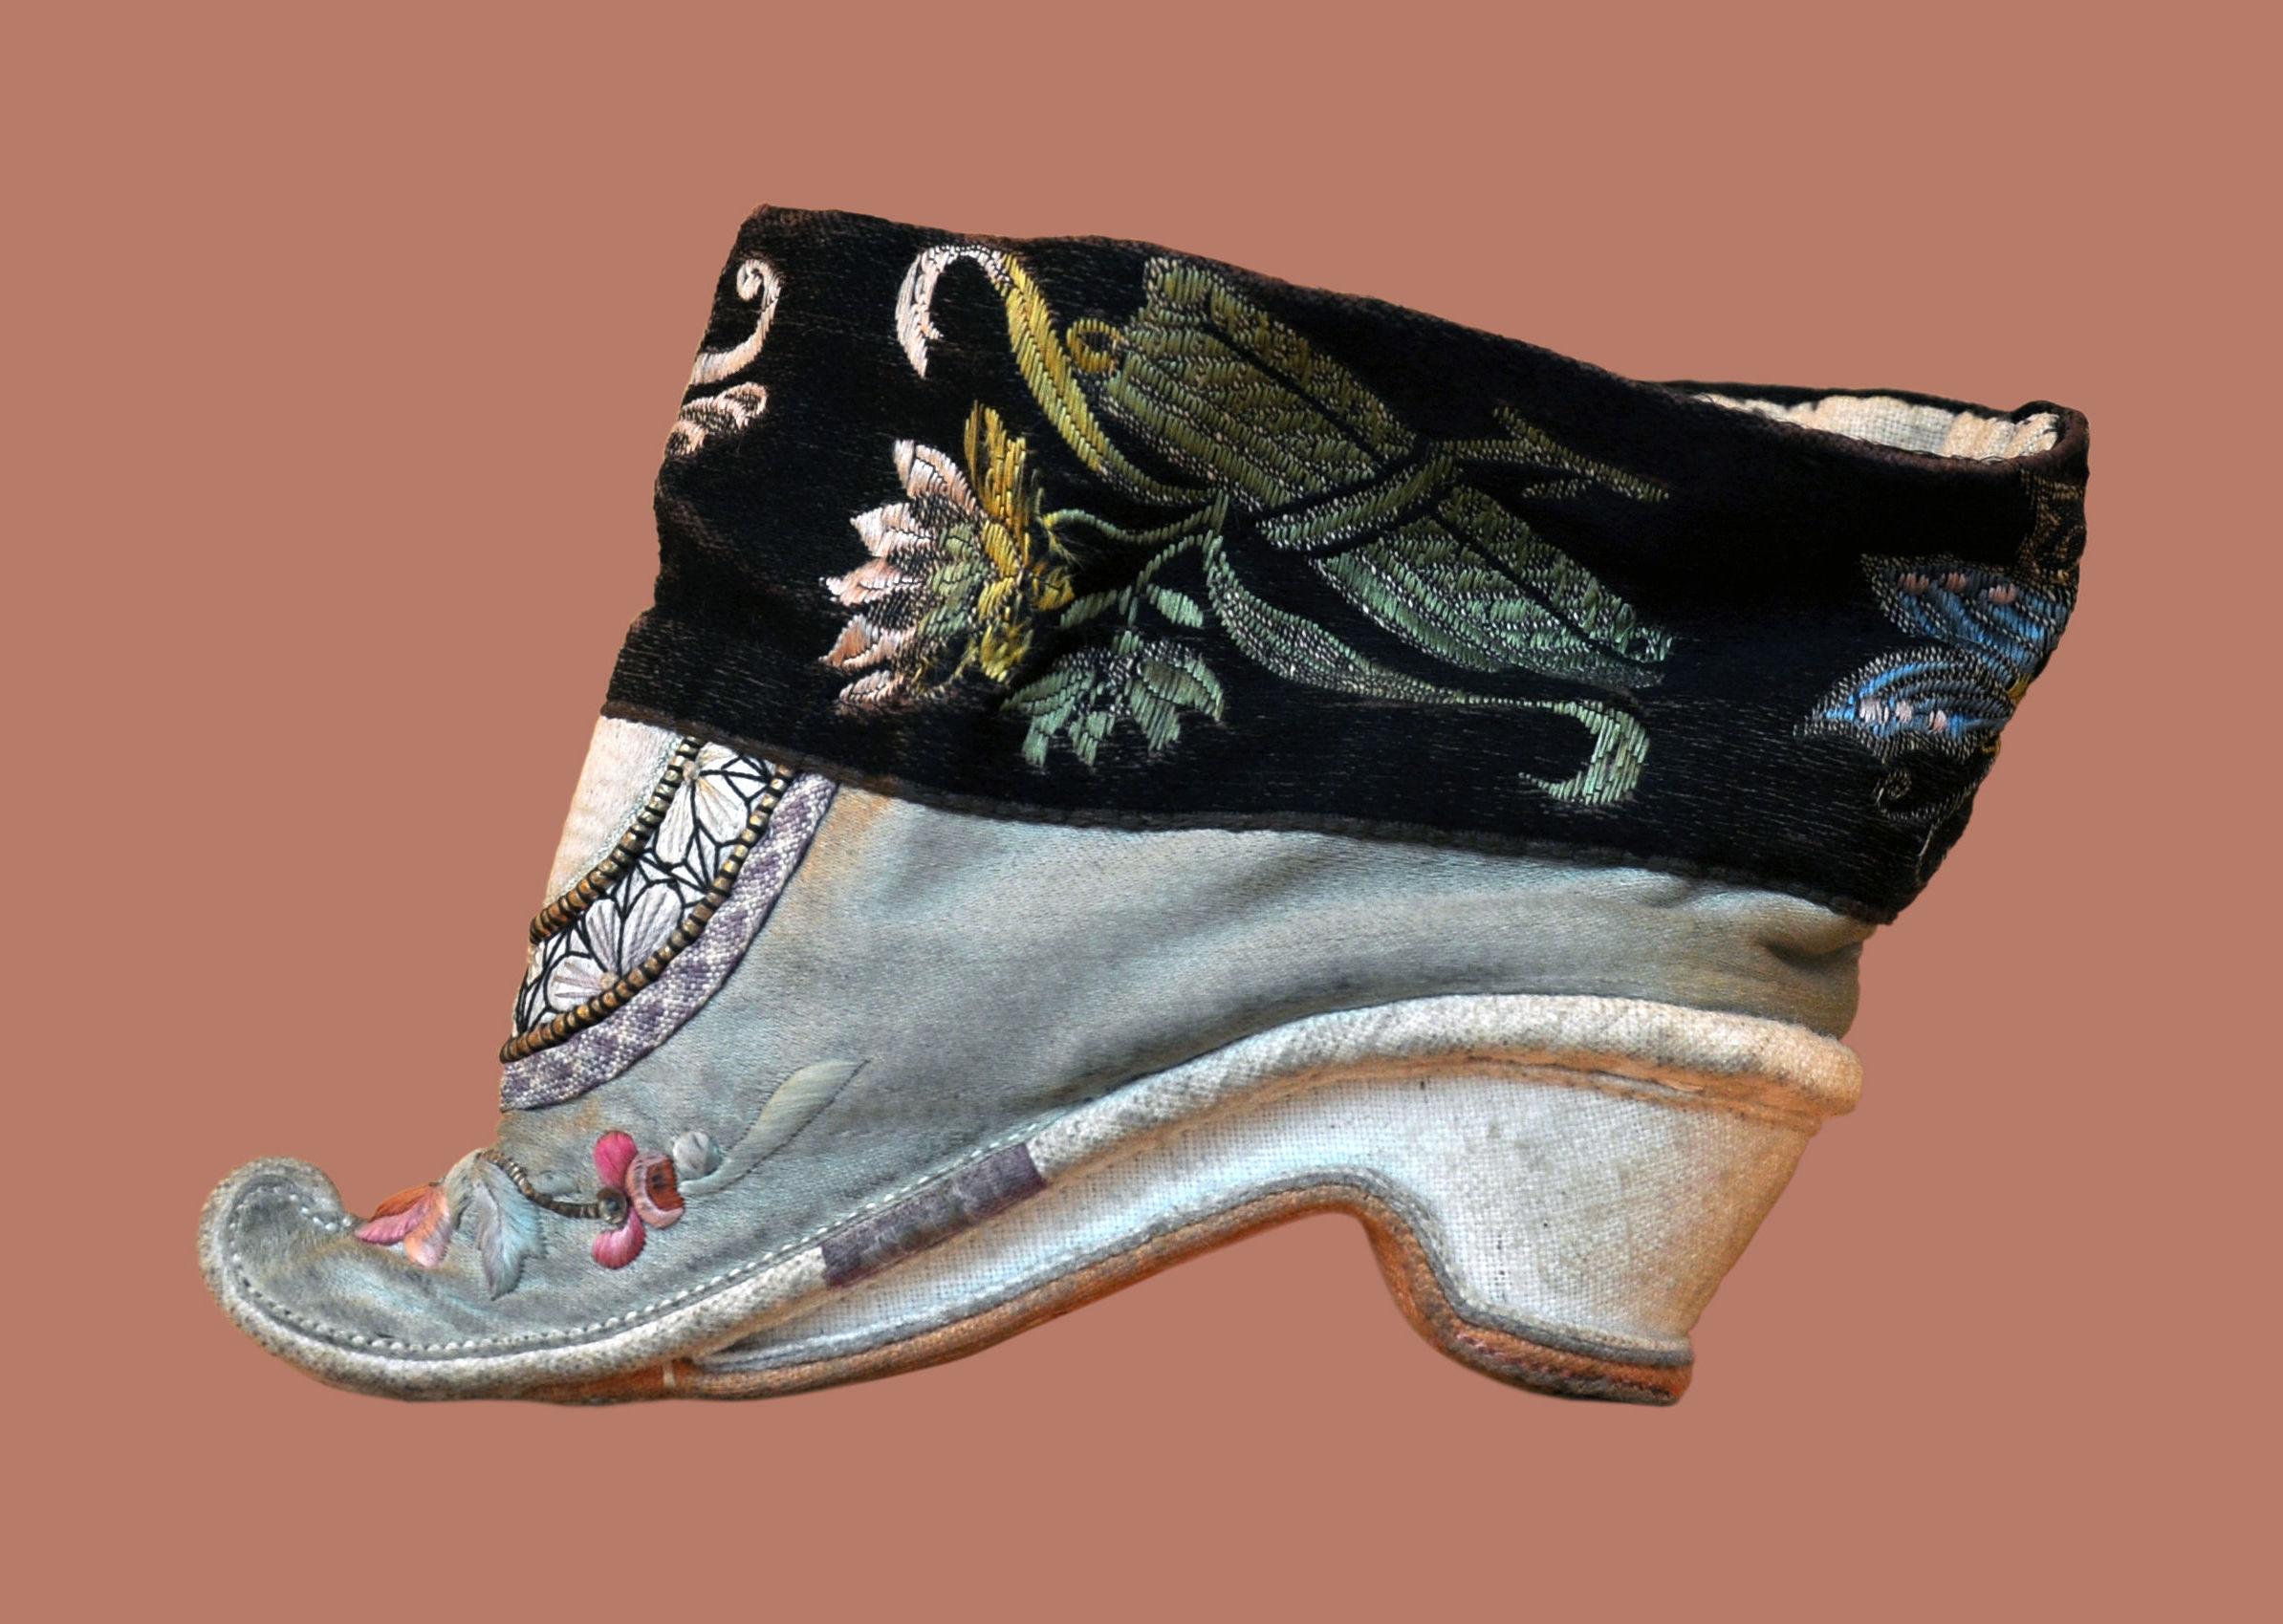 Zapato de pies de loto del siglo XVIII